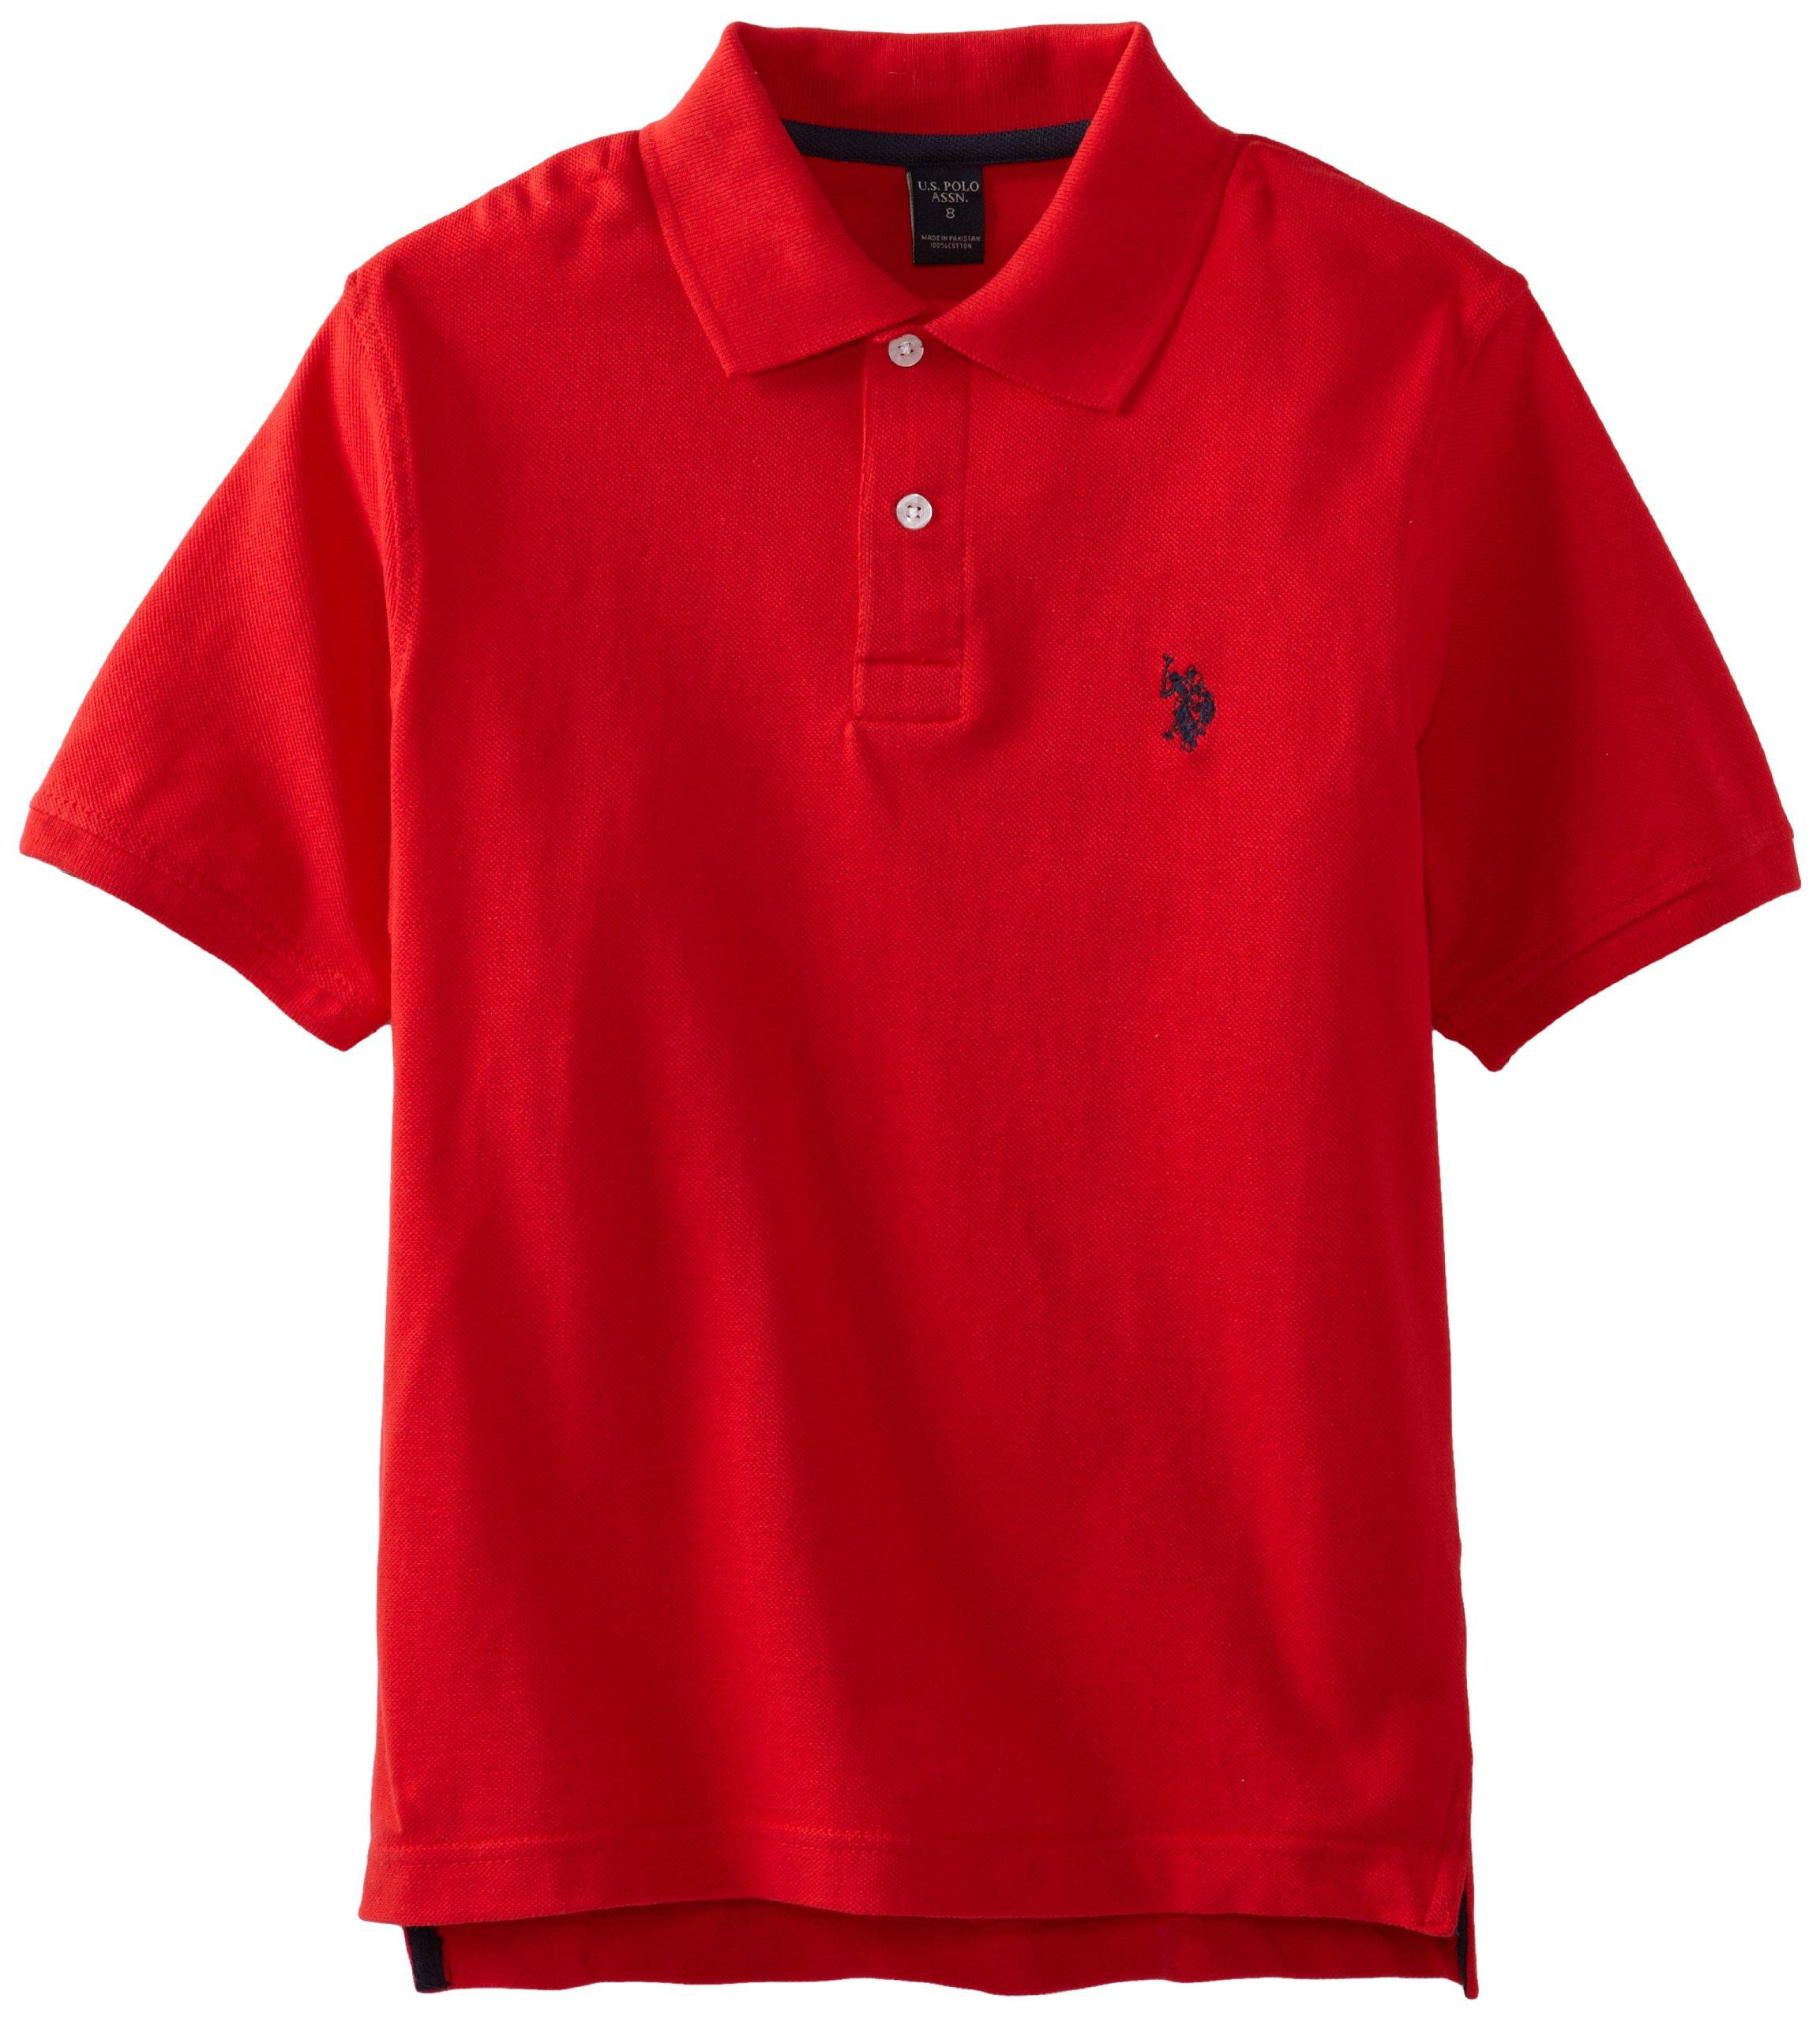 U.S. Polo Assn. Boys' Classic Polo Shirt, Engine Red, 14/16